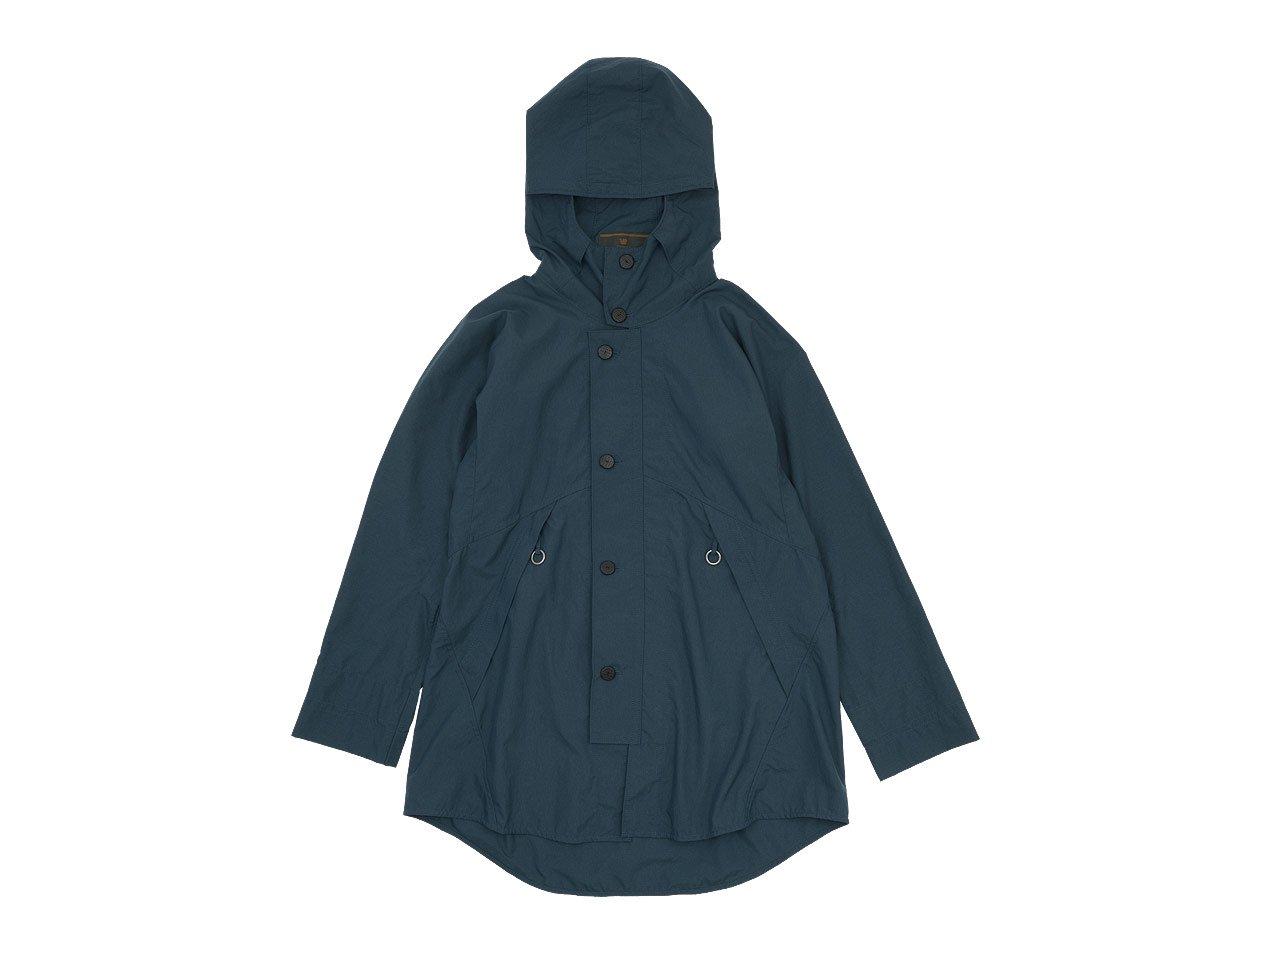 POSTALCO Free Arm Rain Jacket Dark Blue